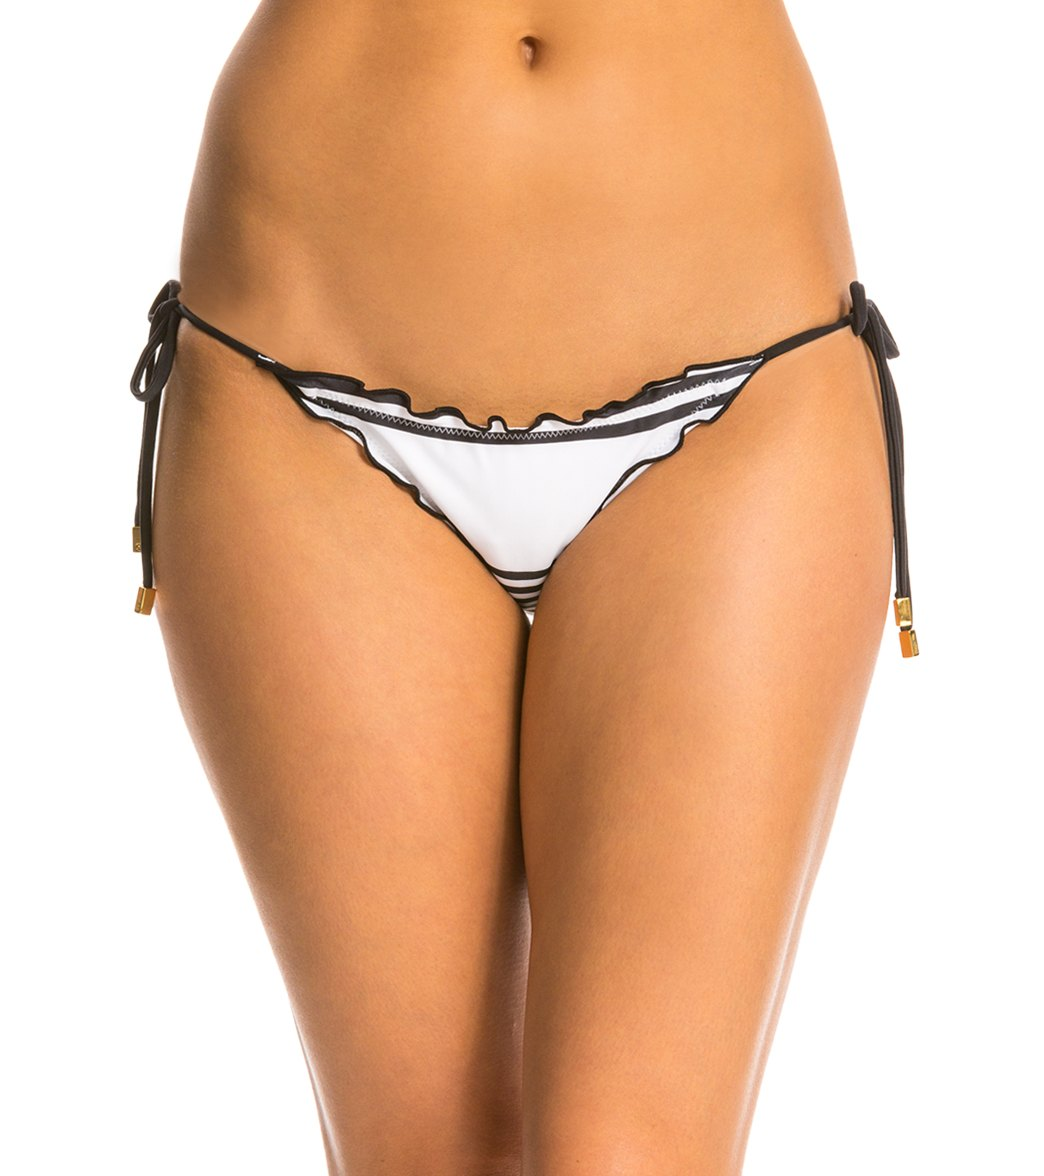 02e76c86383 ... Vix Swimwear Stripes Ripple Tie Side Full Bikini Bottom. Play Video.  MODEL MEASUREMENTS